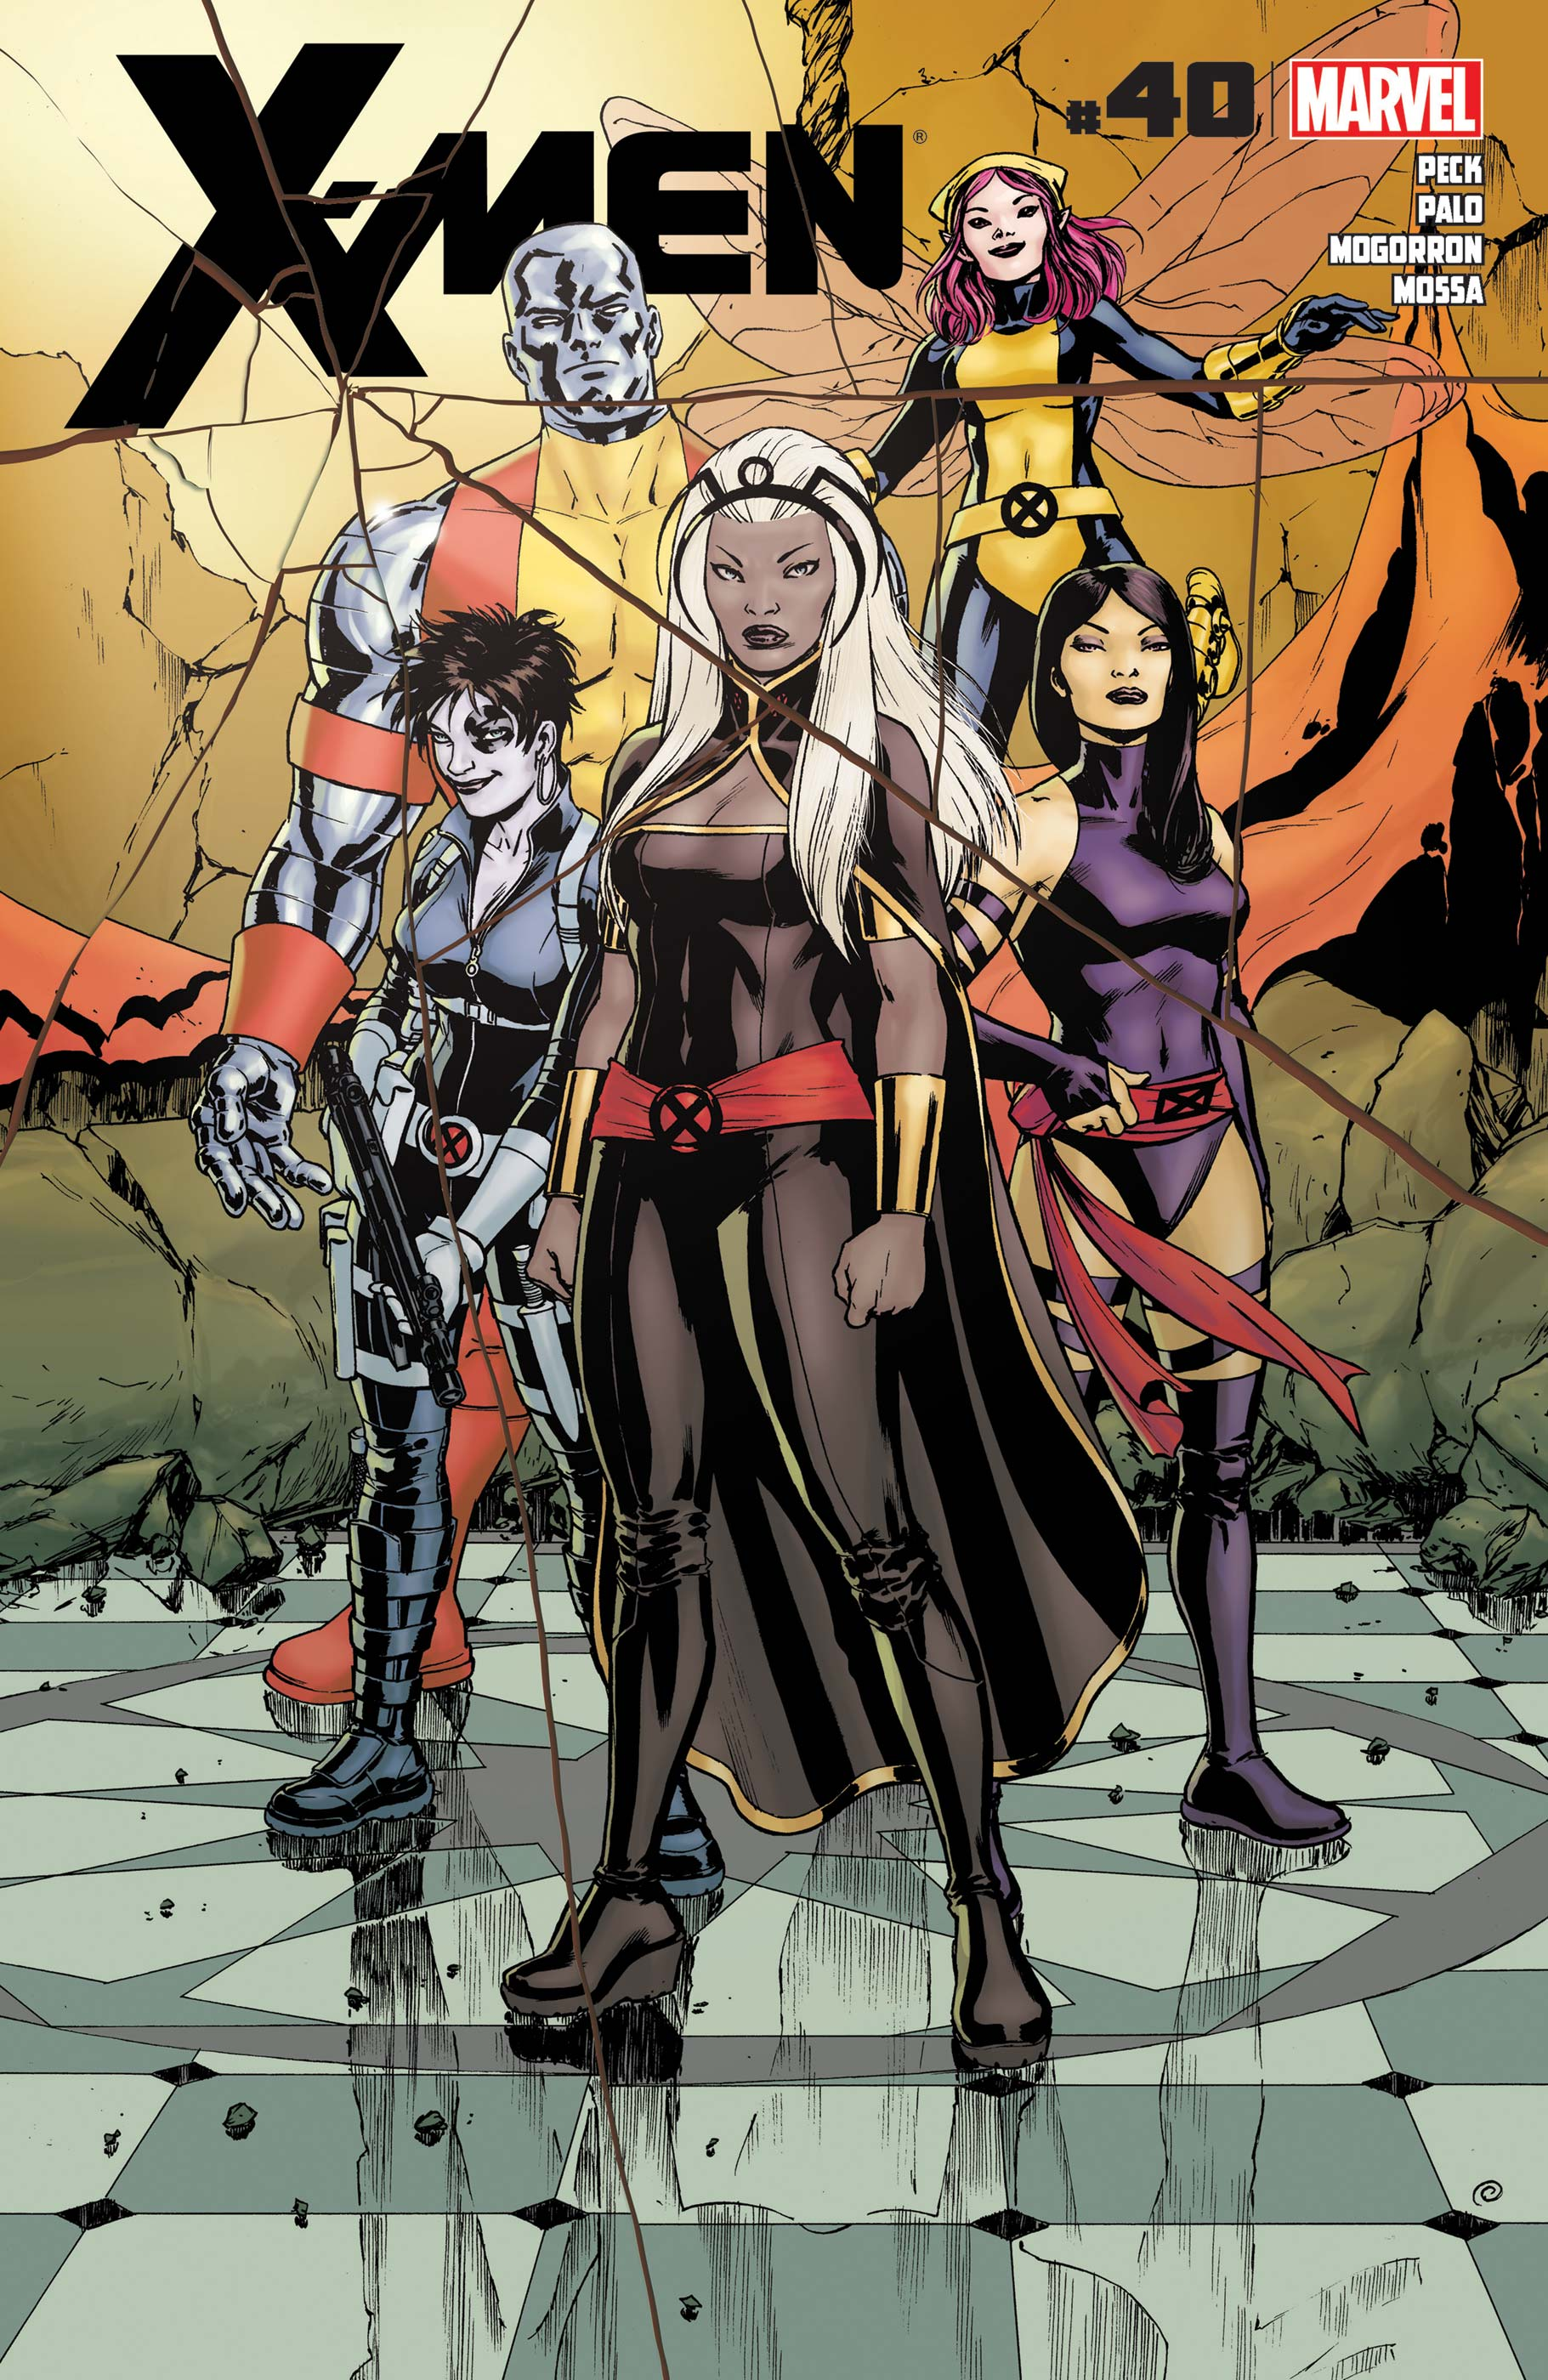 X-Men (2010) #40